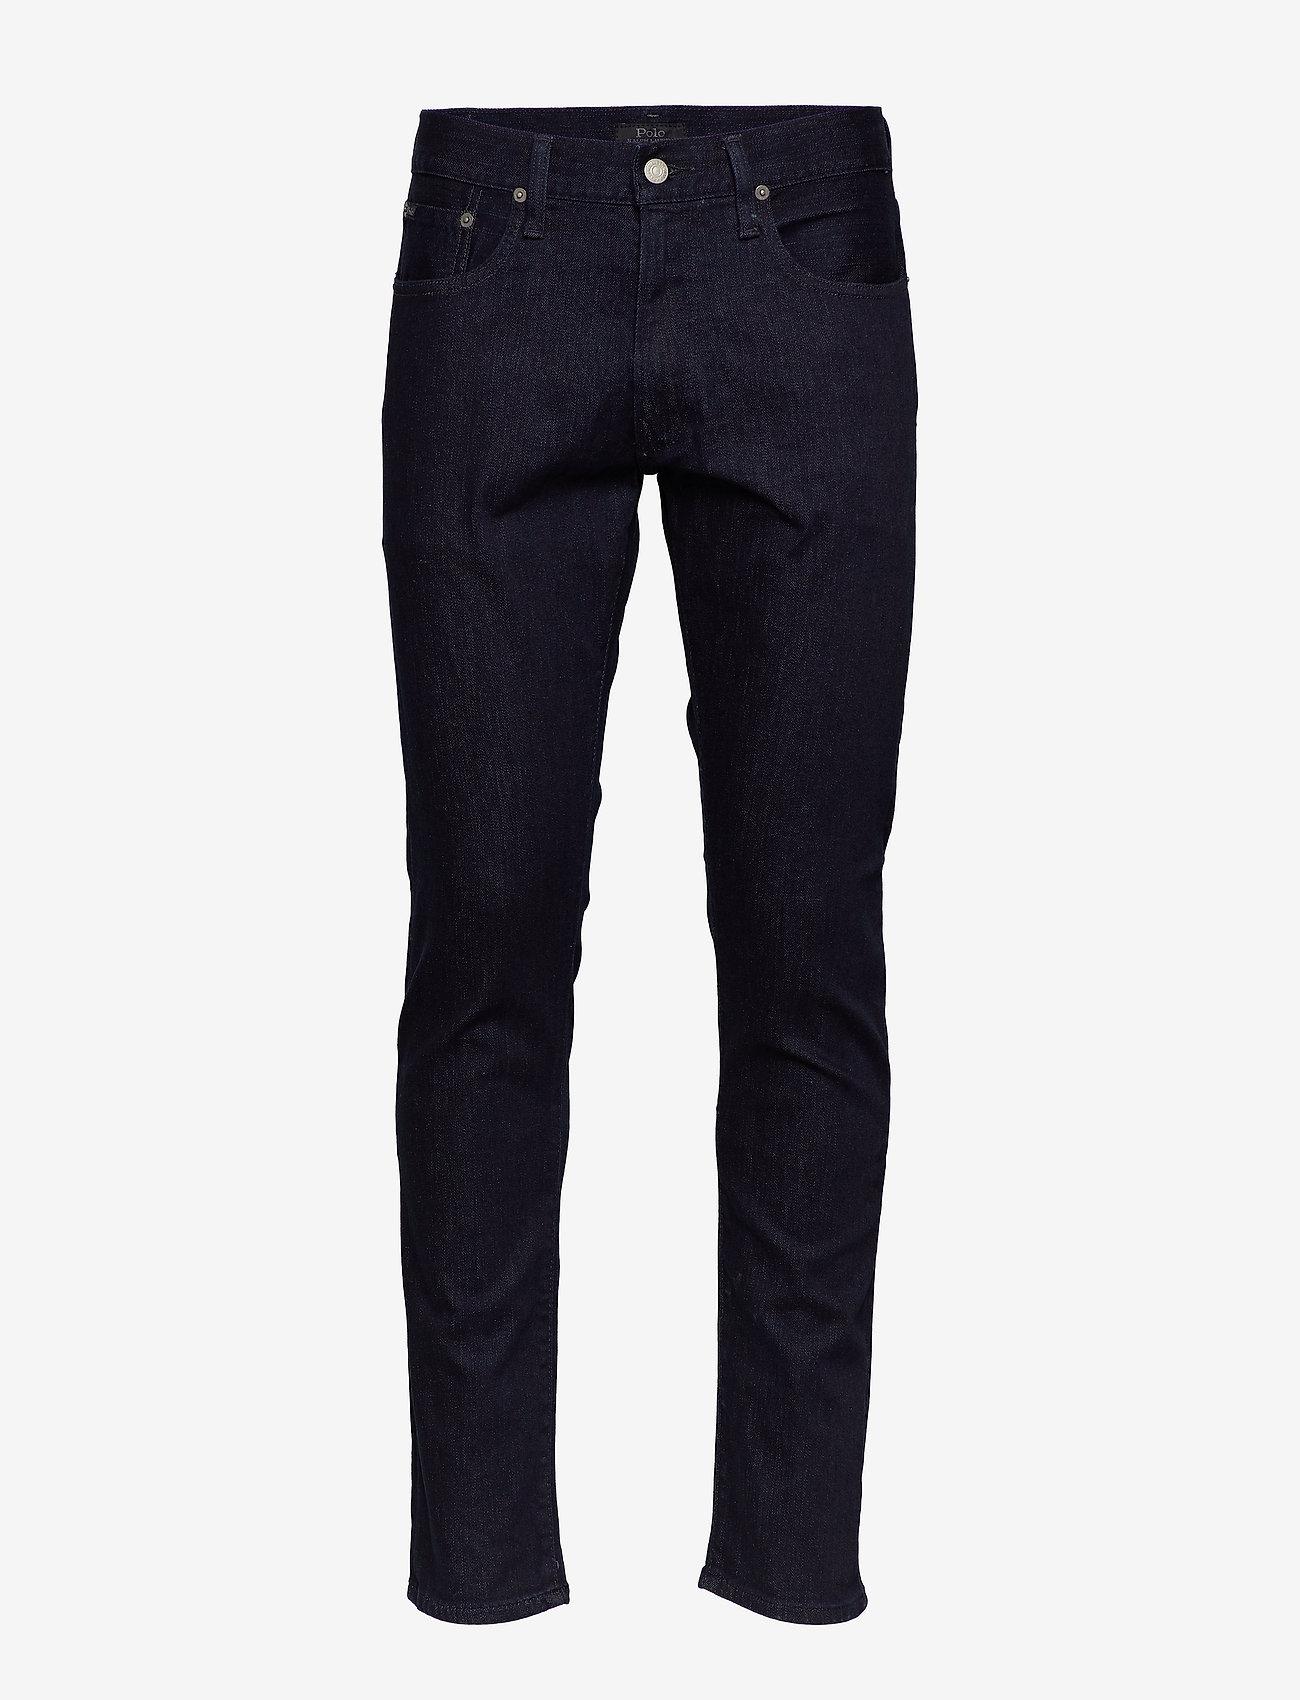 Polo Ralph Lauren - 0 - slim jeans - miller stretch - 0